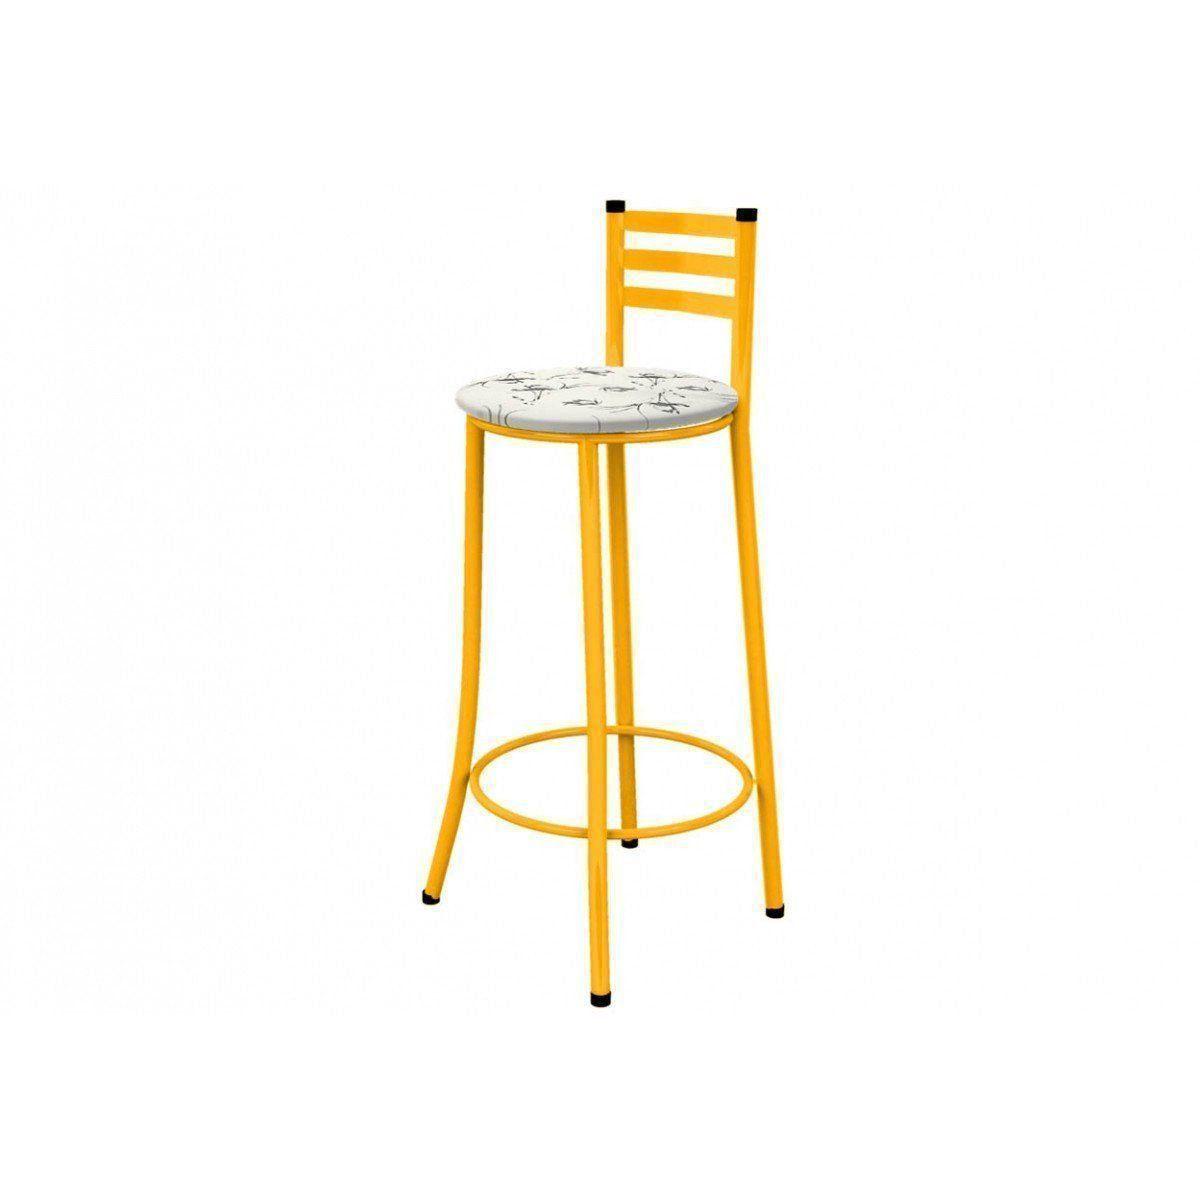 Banqueta Alta com Encosto 86 cm Amarela - Marcheli